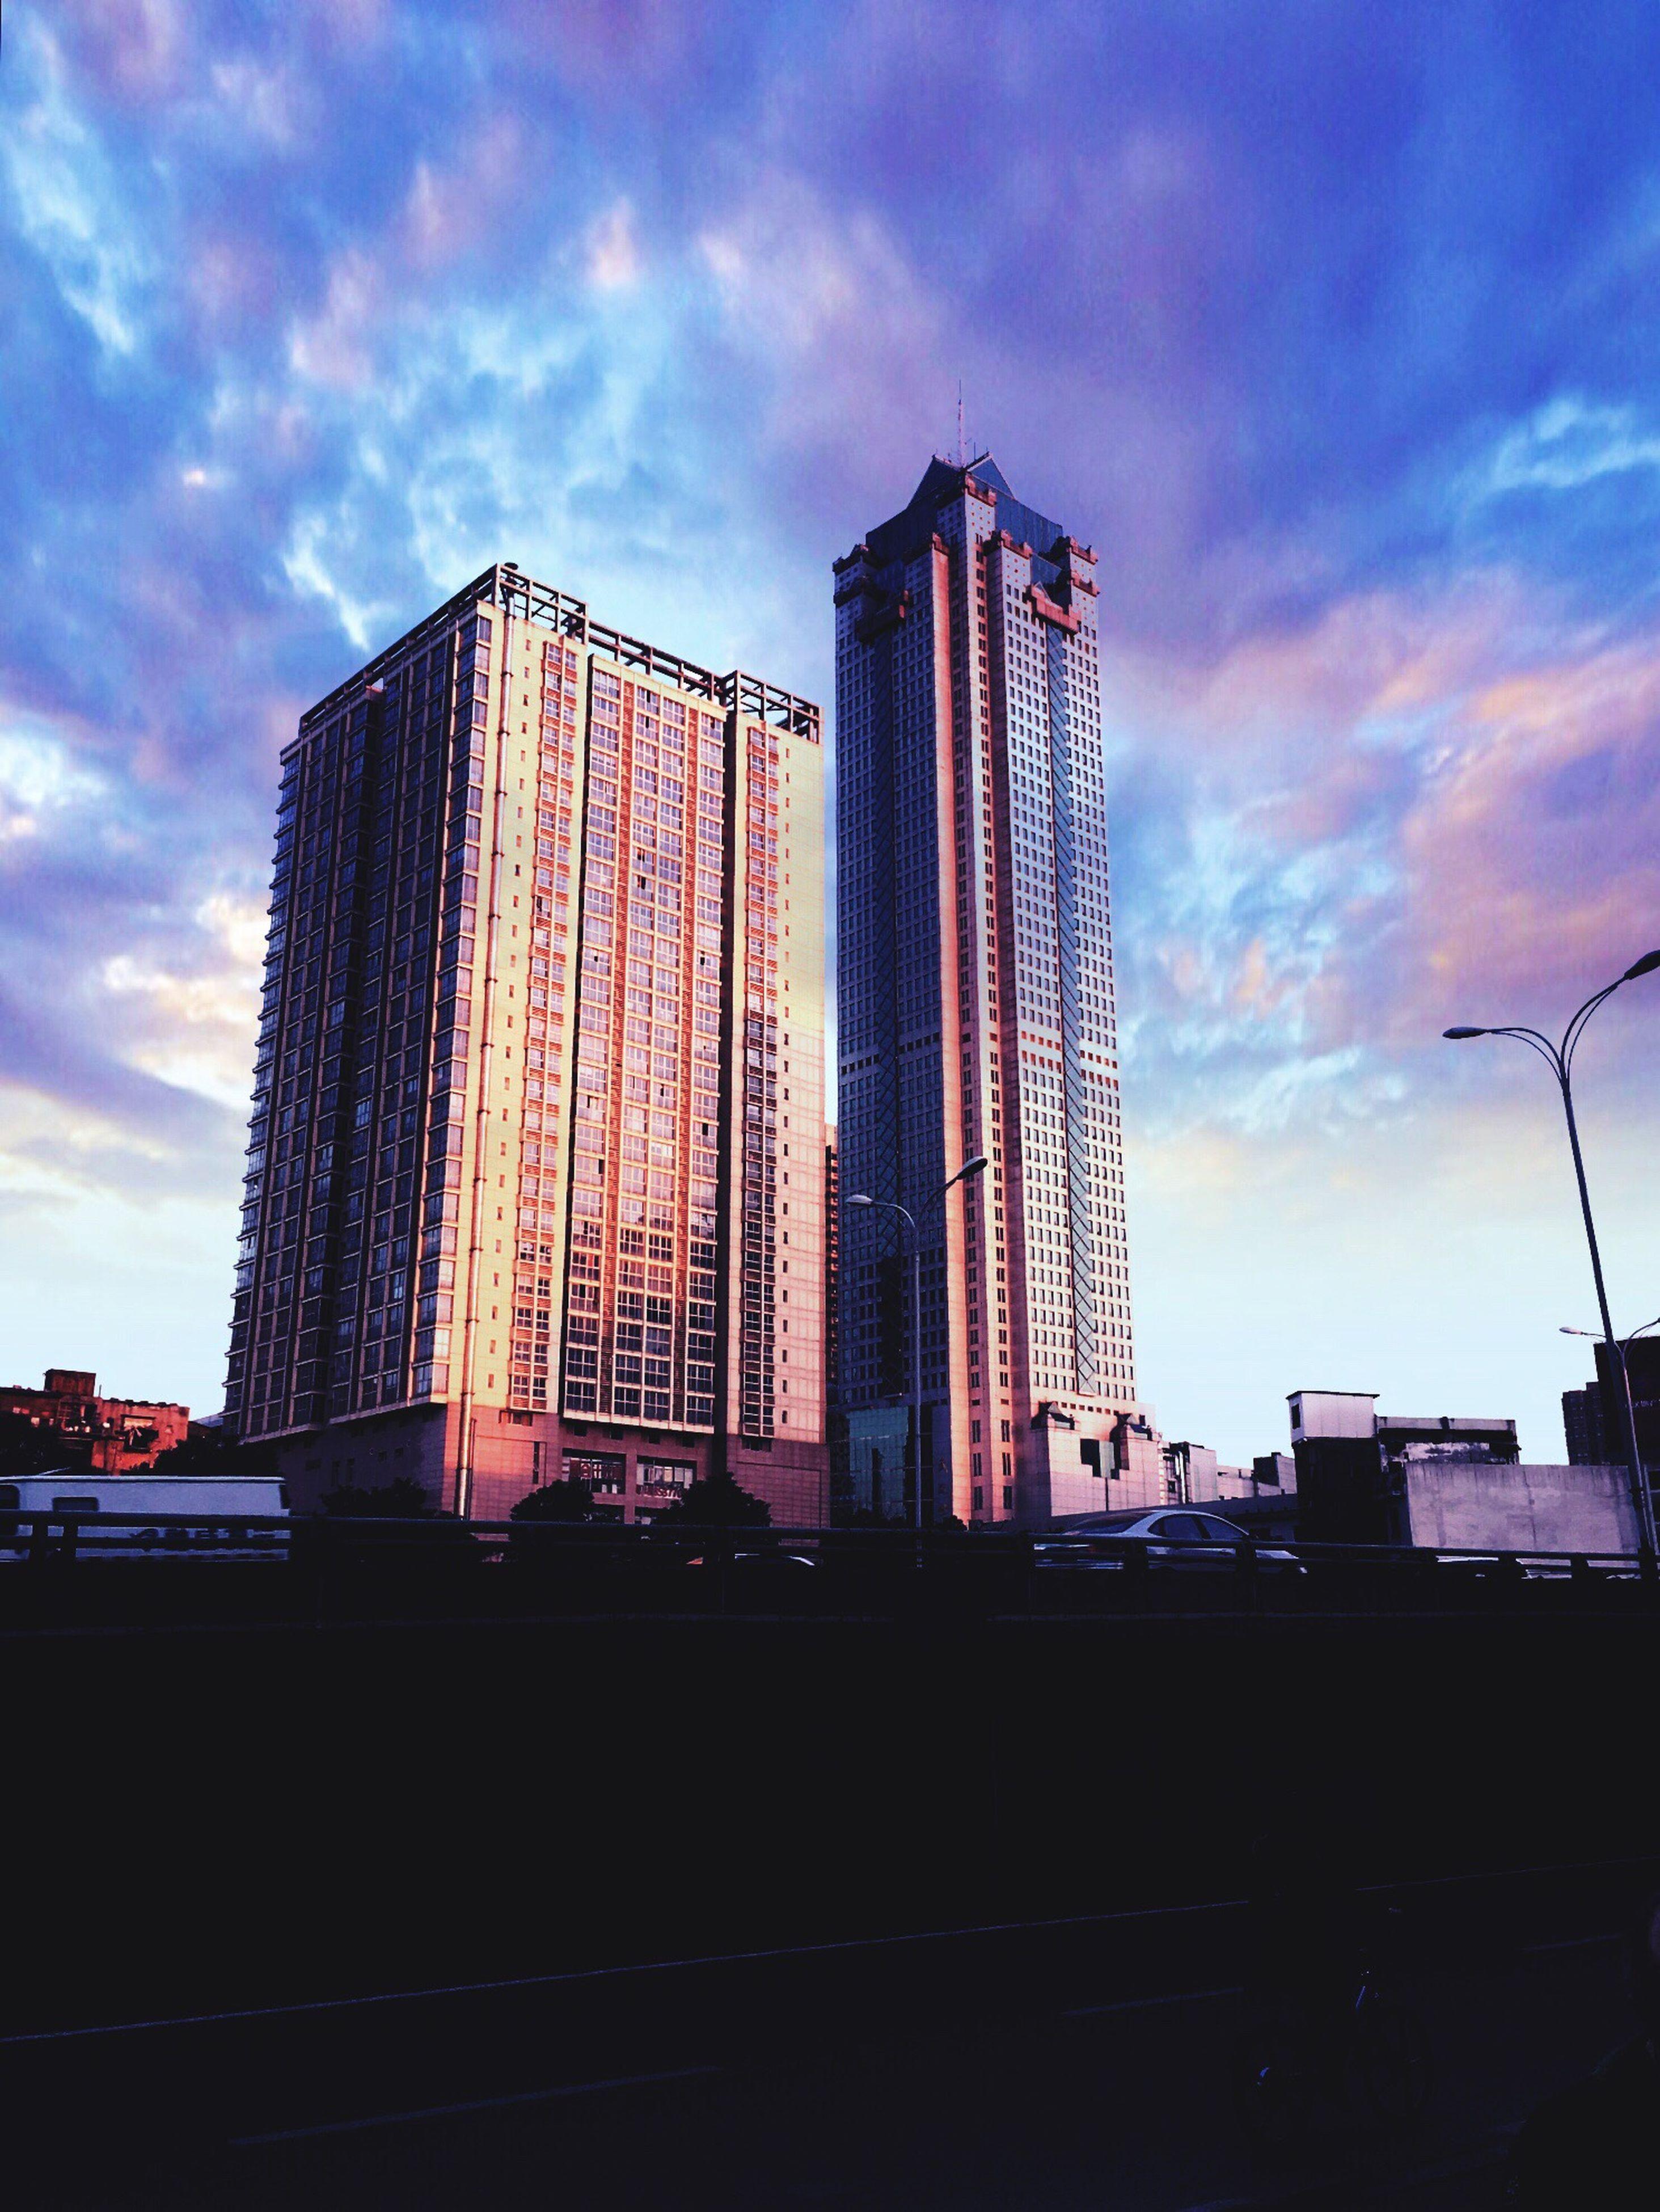 city, architecture, sky, skyscraper, building exterior, low angle view, built structure, urban skyline, outdoors, no people, cloud - sky, cityscape, suspension bridge, day